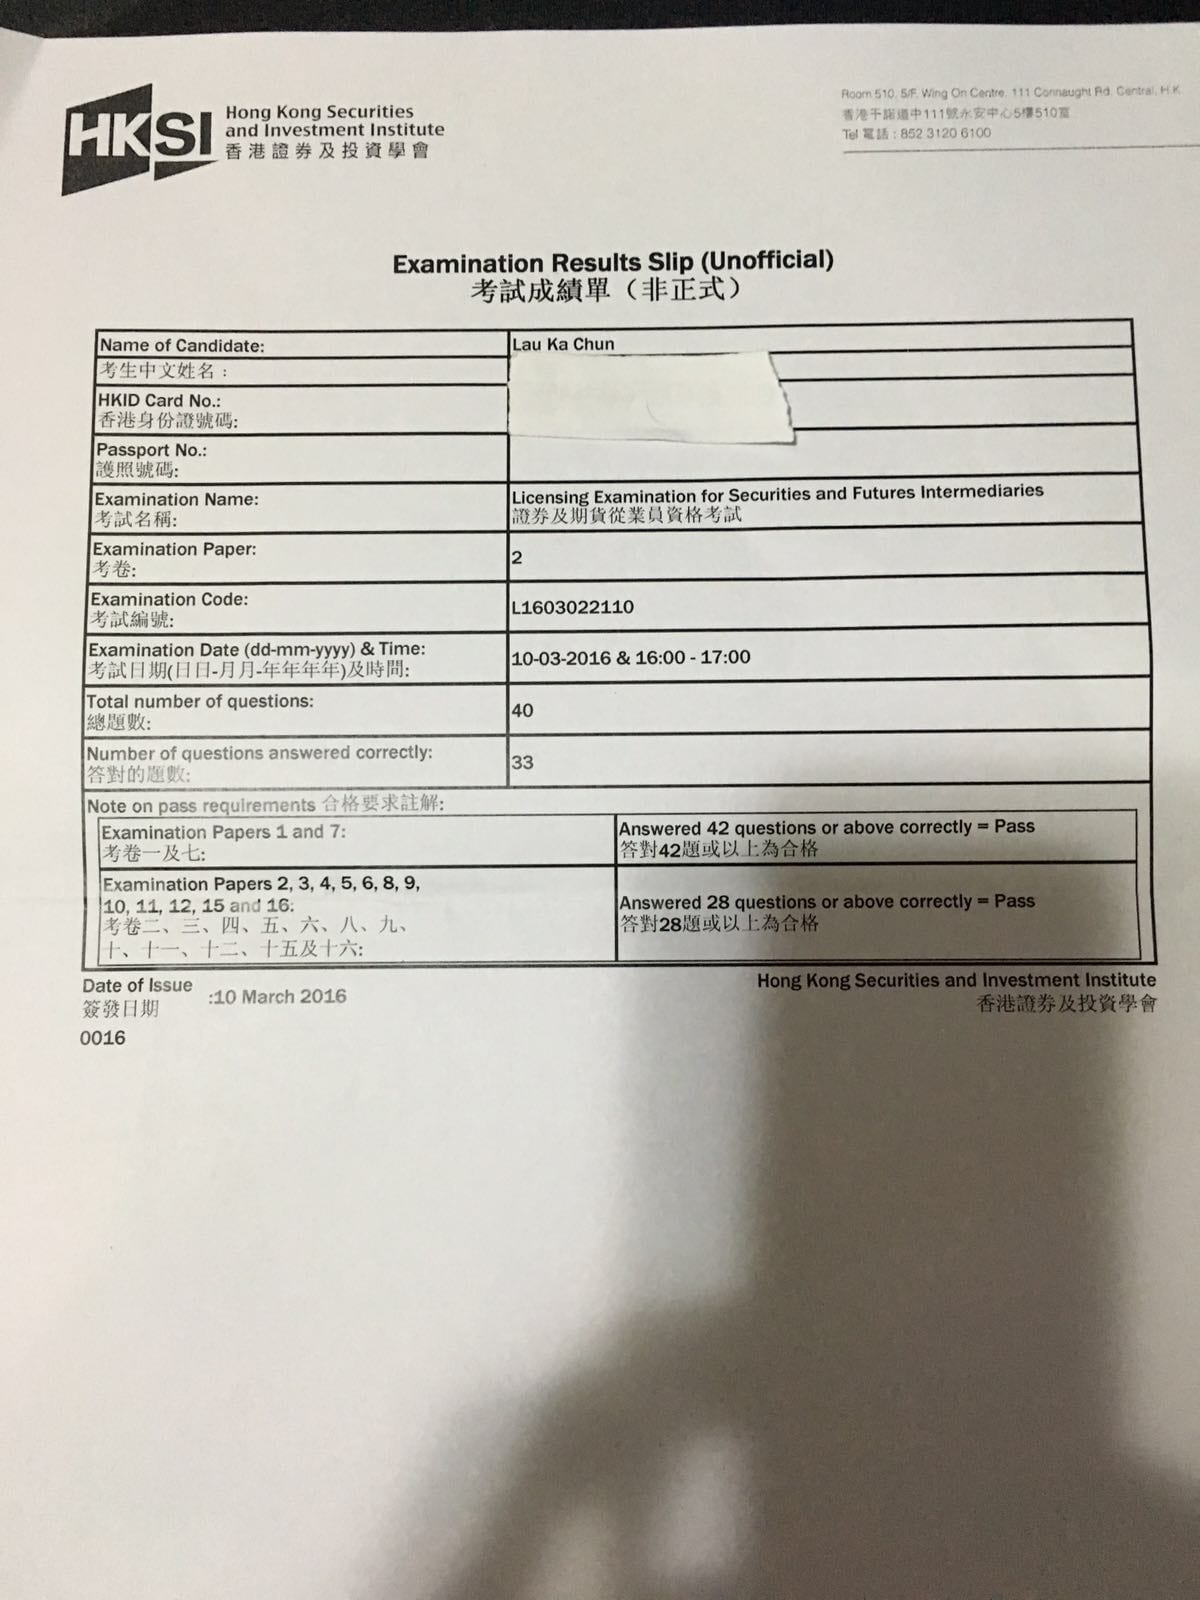 KCLau 10/3/2016 LE Paper 2 證券期貨從業員資格考試卷二 Pass